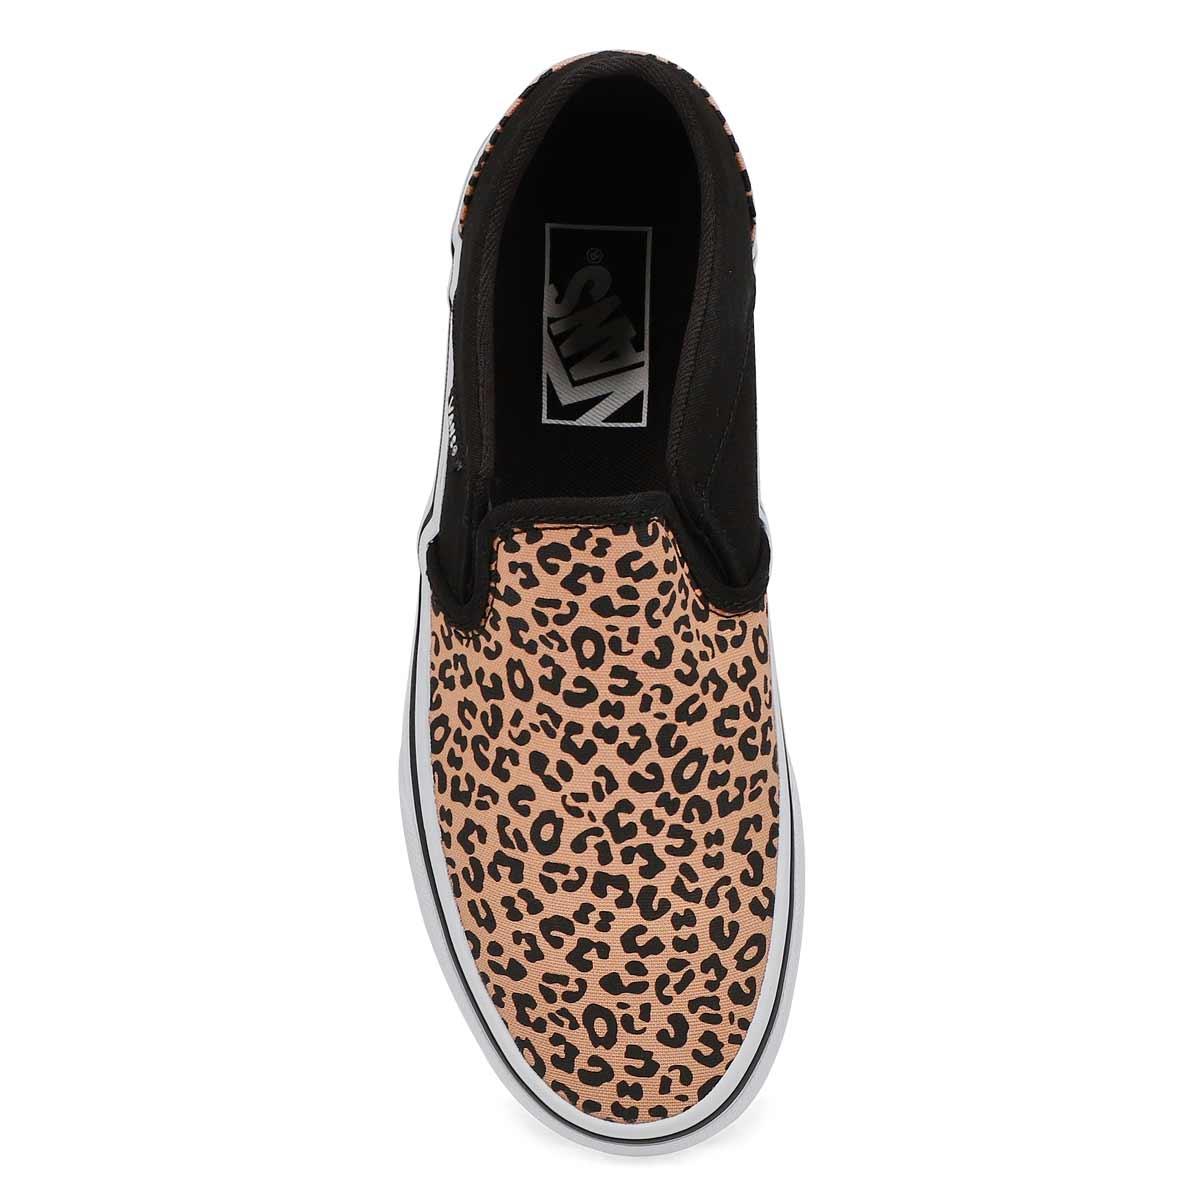 Women's Asher Sneaker - Cheetah/Black/White